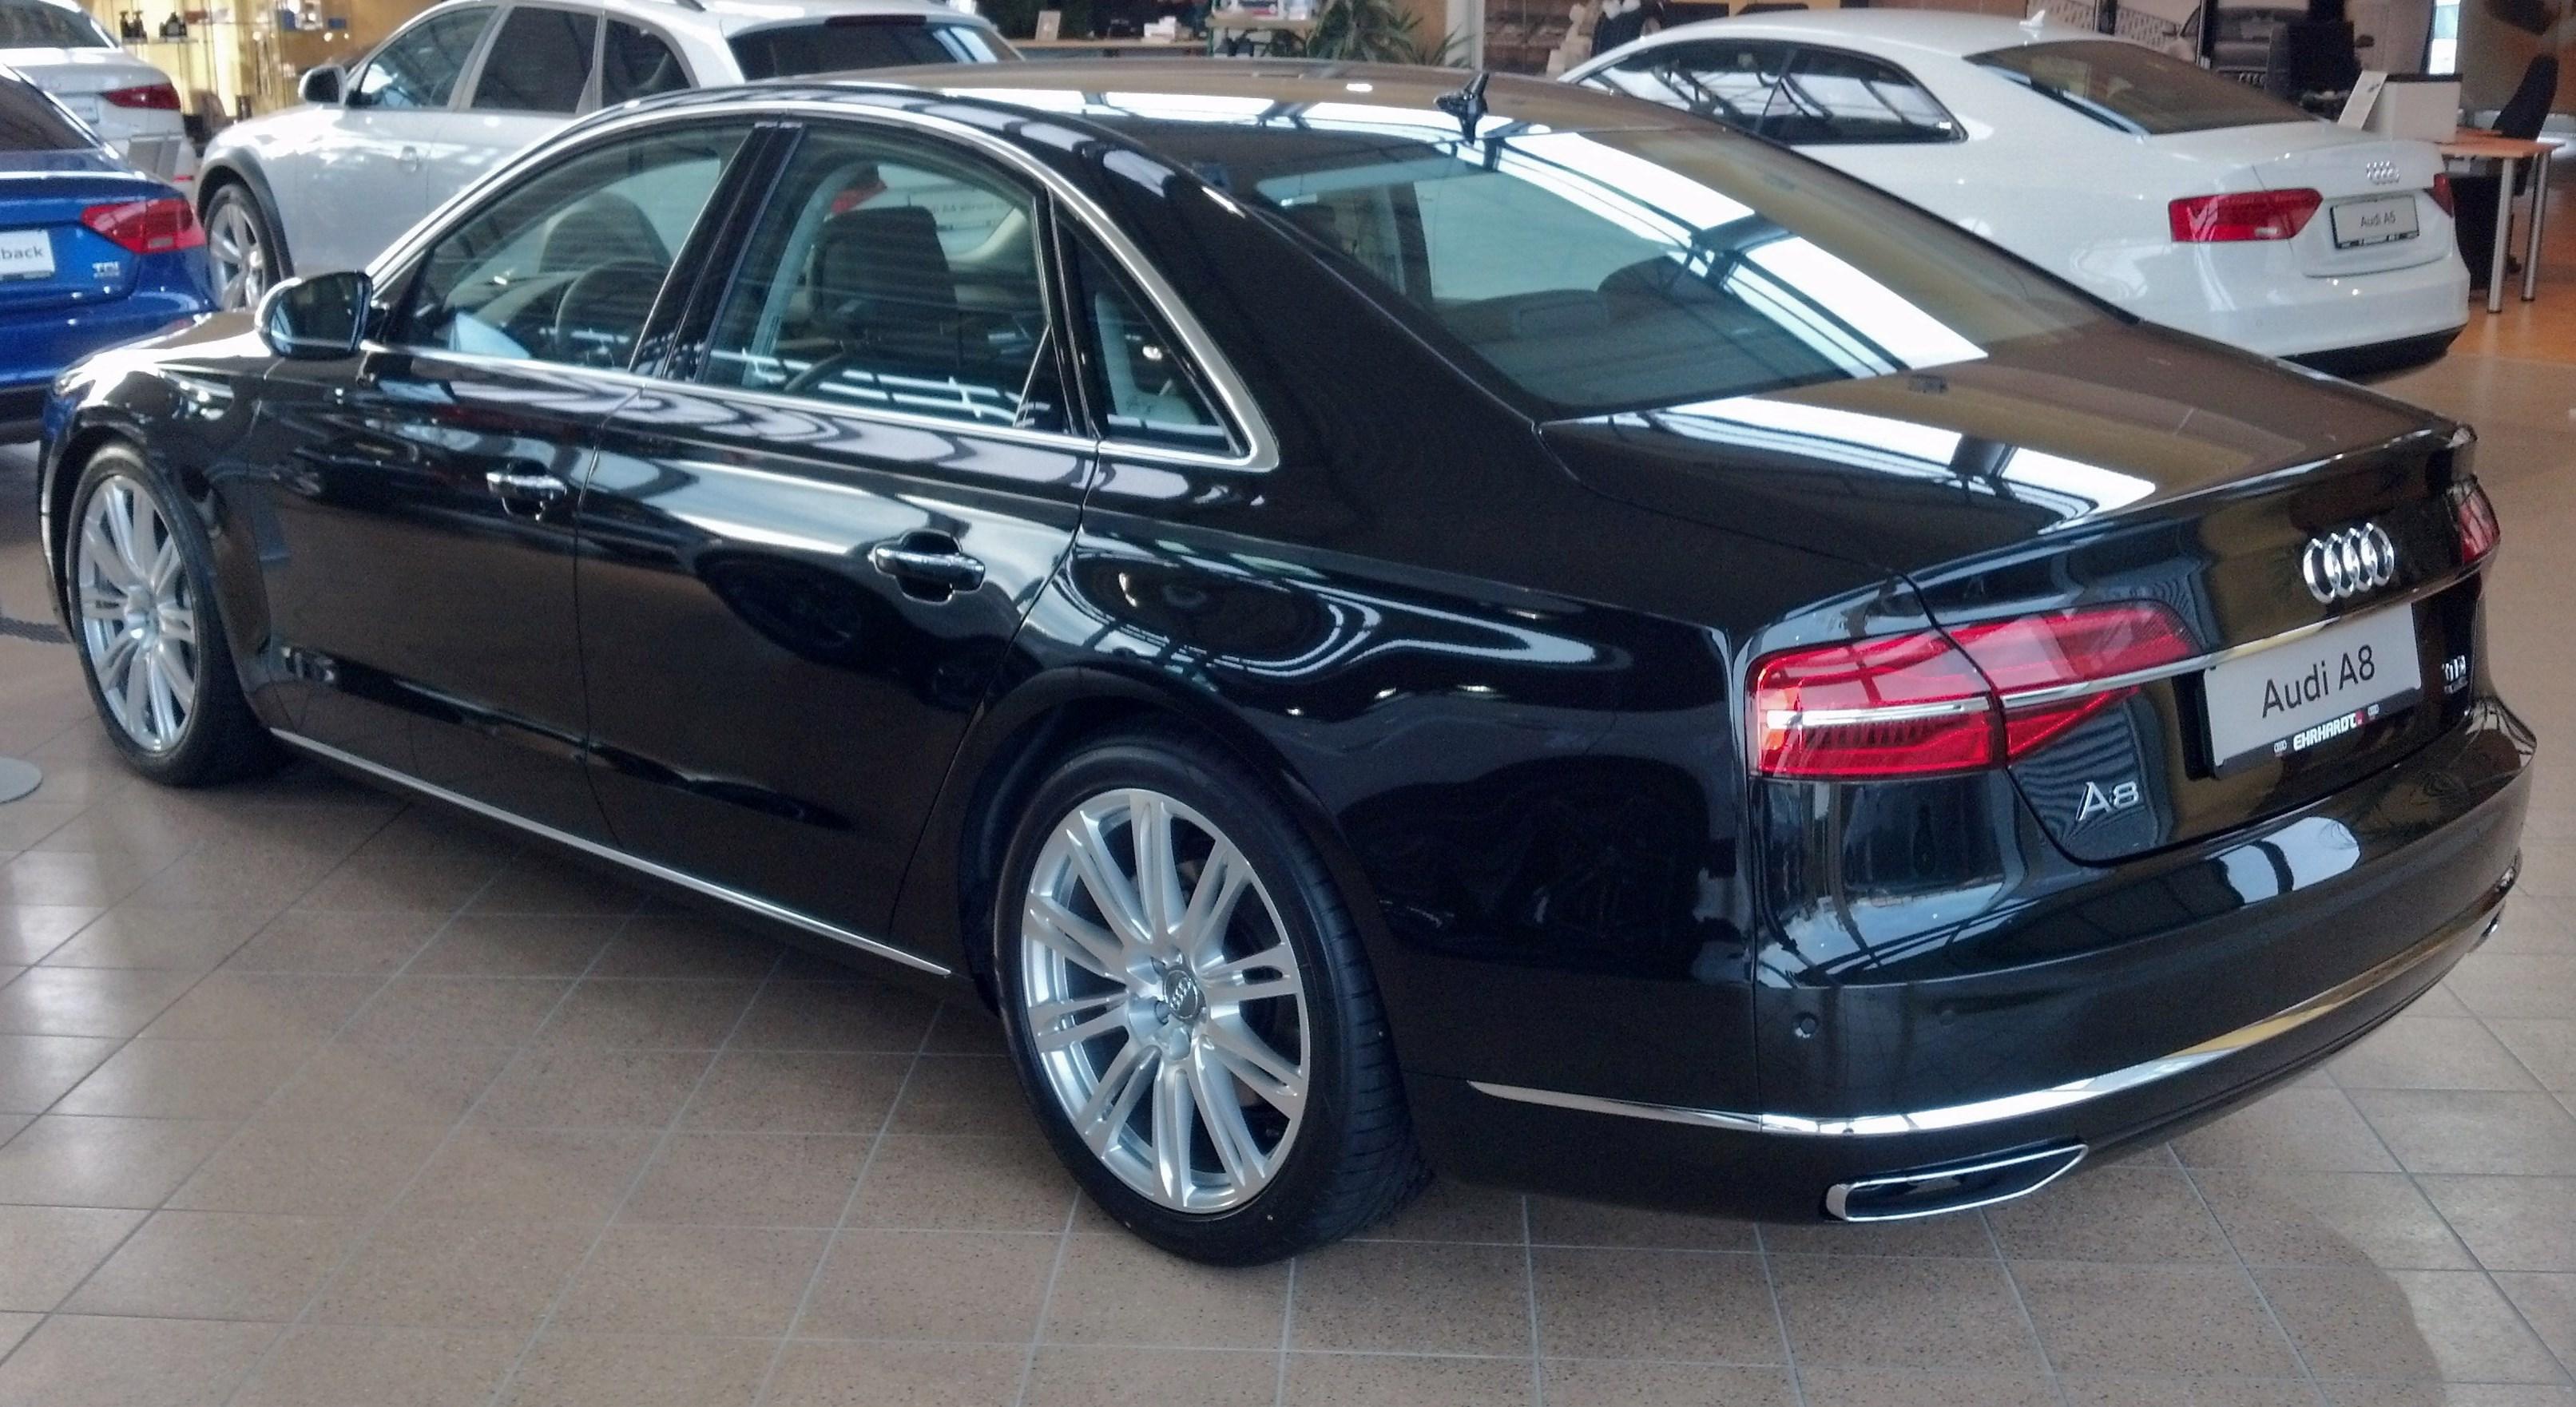 Kelebihan Audi A8 3.0 Tdi Murah Berkualitas